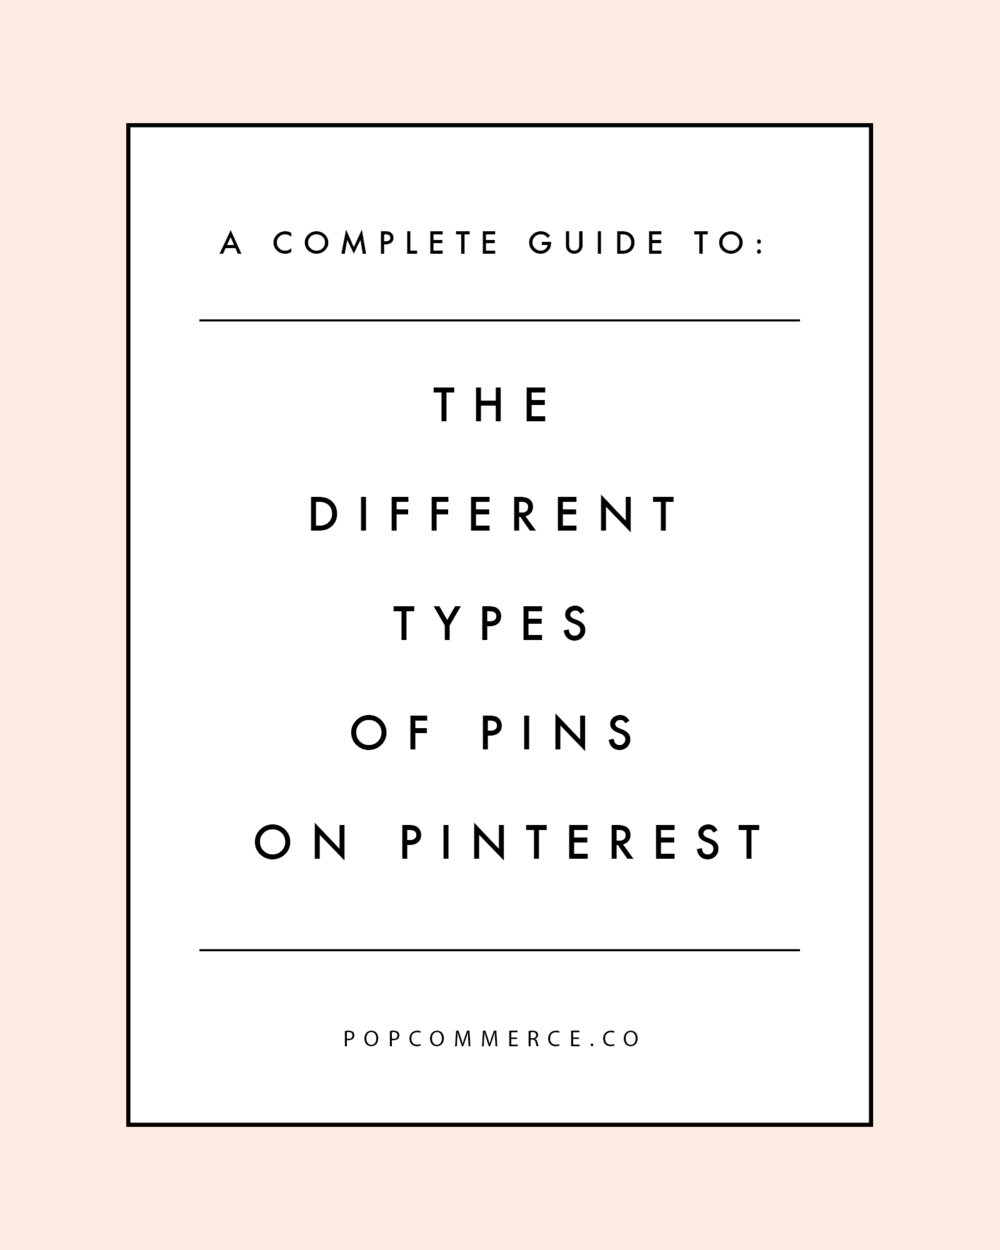 popcommerce_pinterest.png